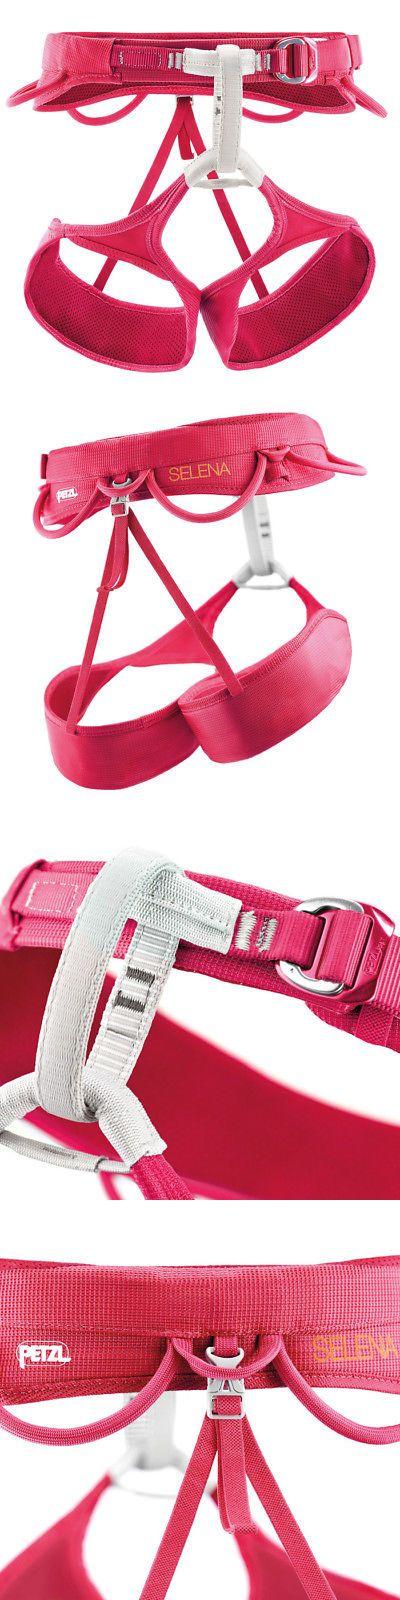 Harnesses 50815: Petzl Women S Selena Rock Climbing Harness -> BUY IT NOW ONLY: $61.7 on eBay!